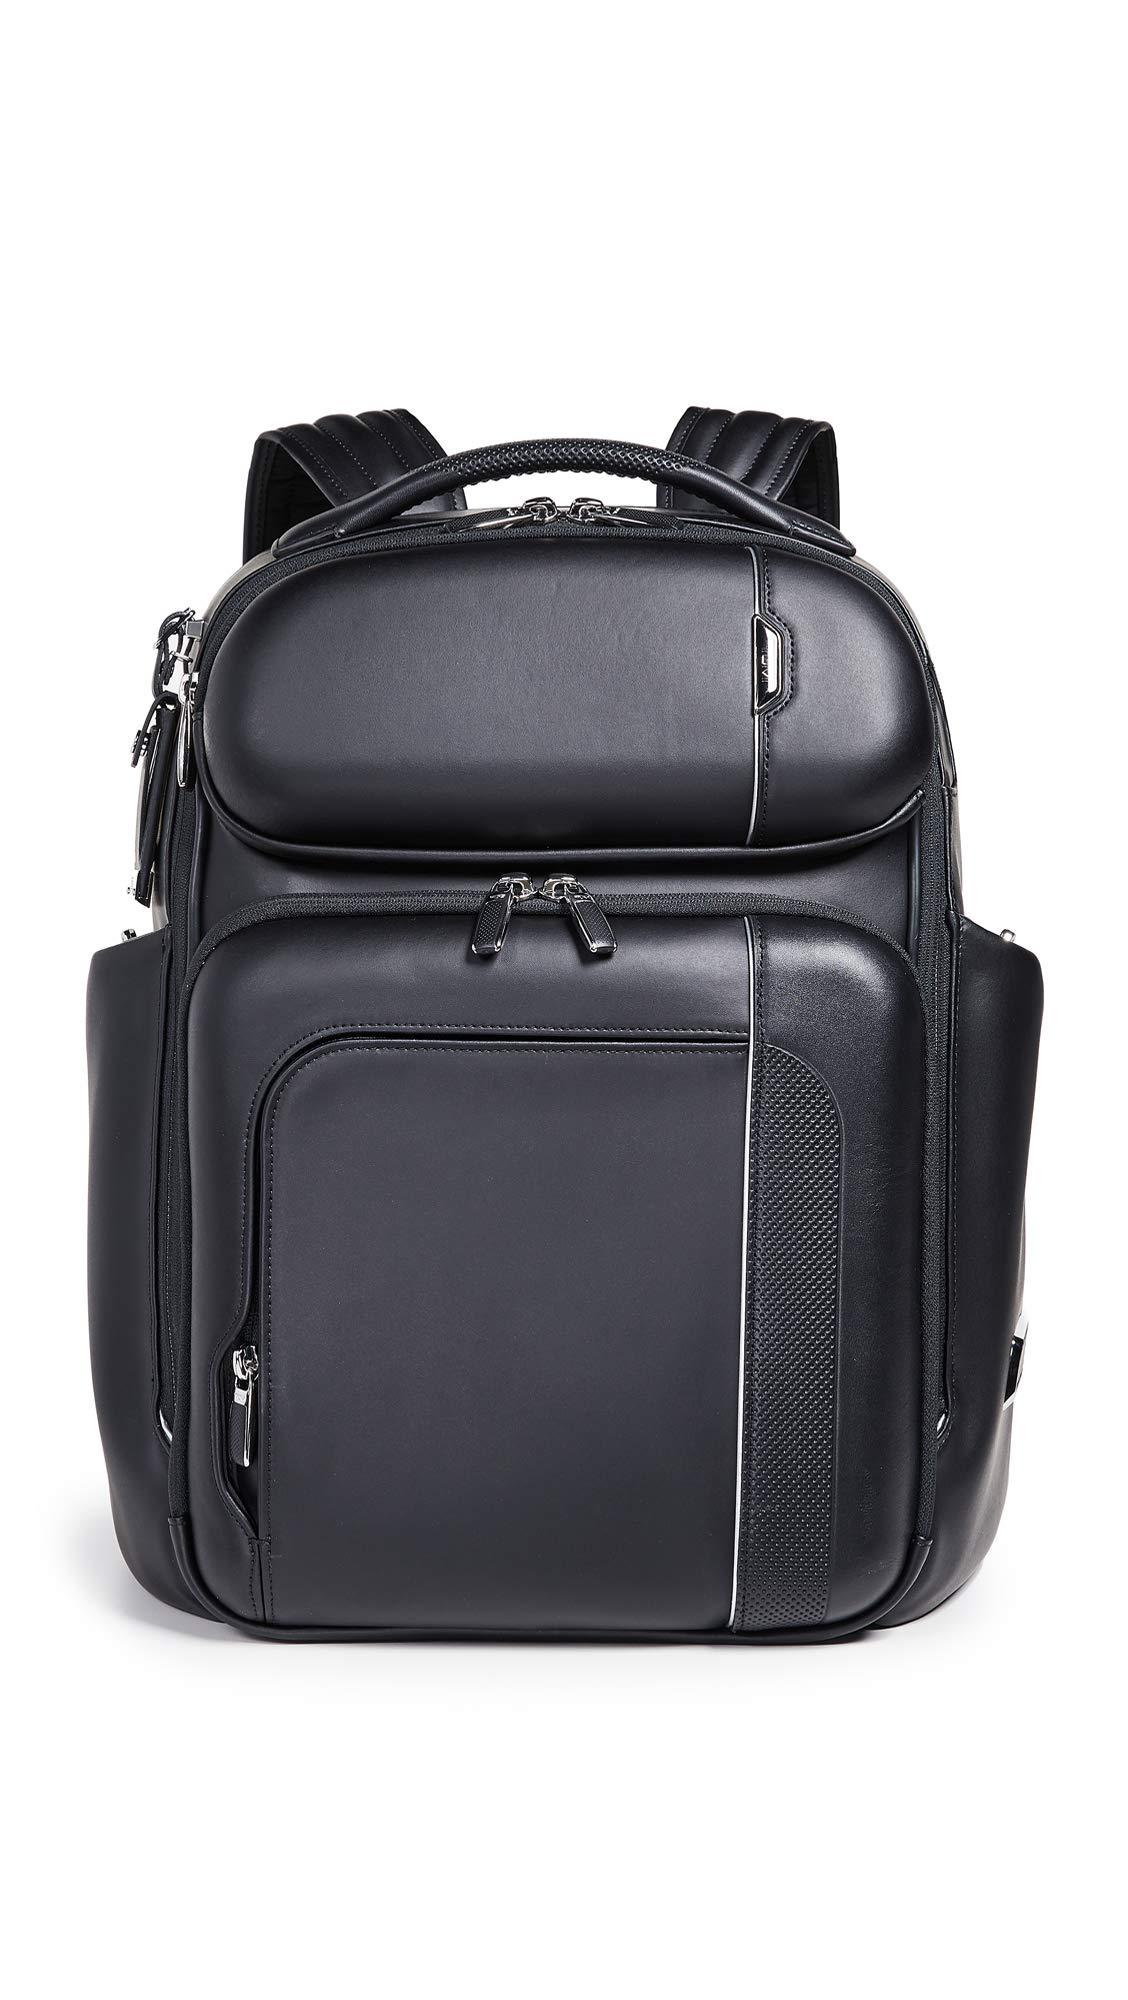 Tumi Men's Arrivé Barker Backpack, Black, One Size